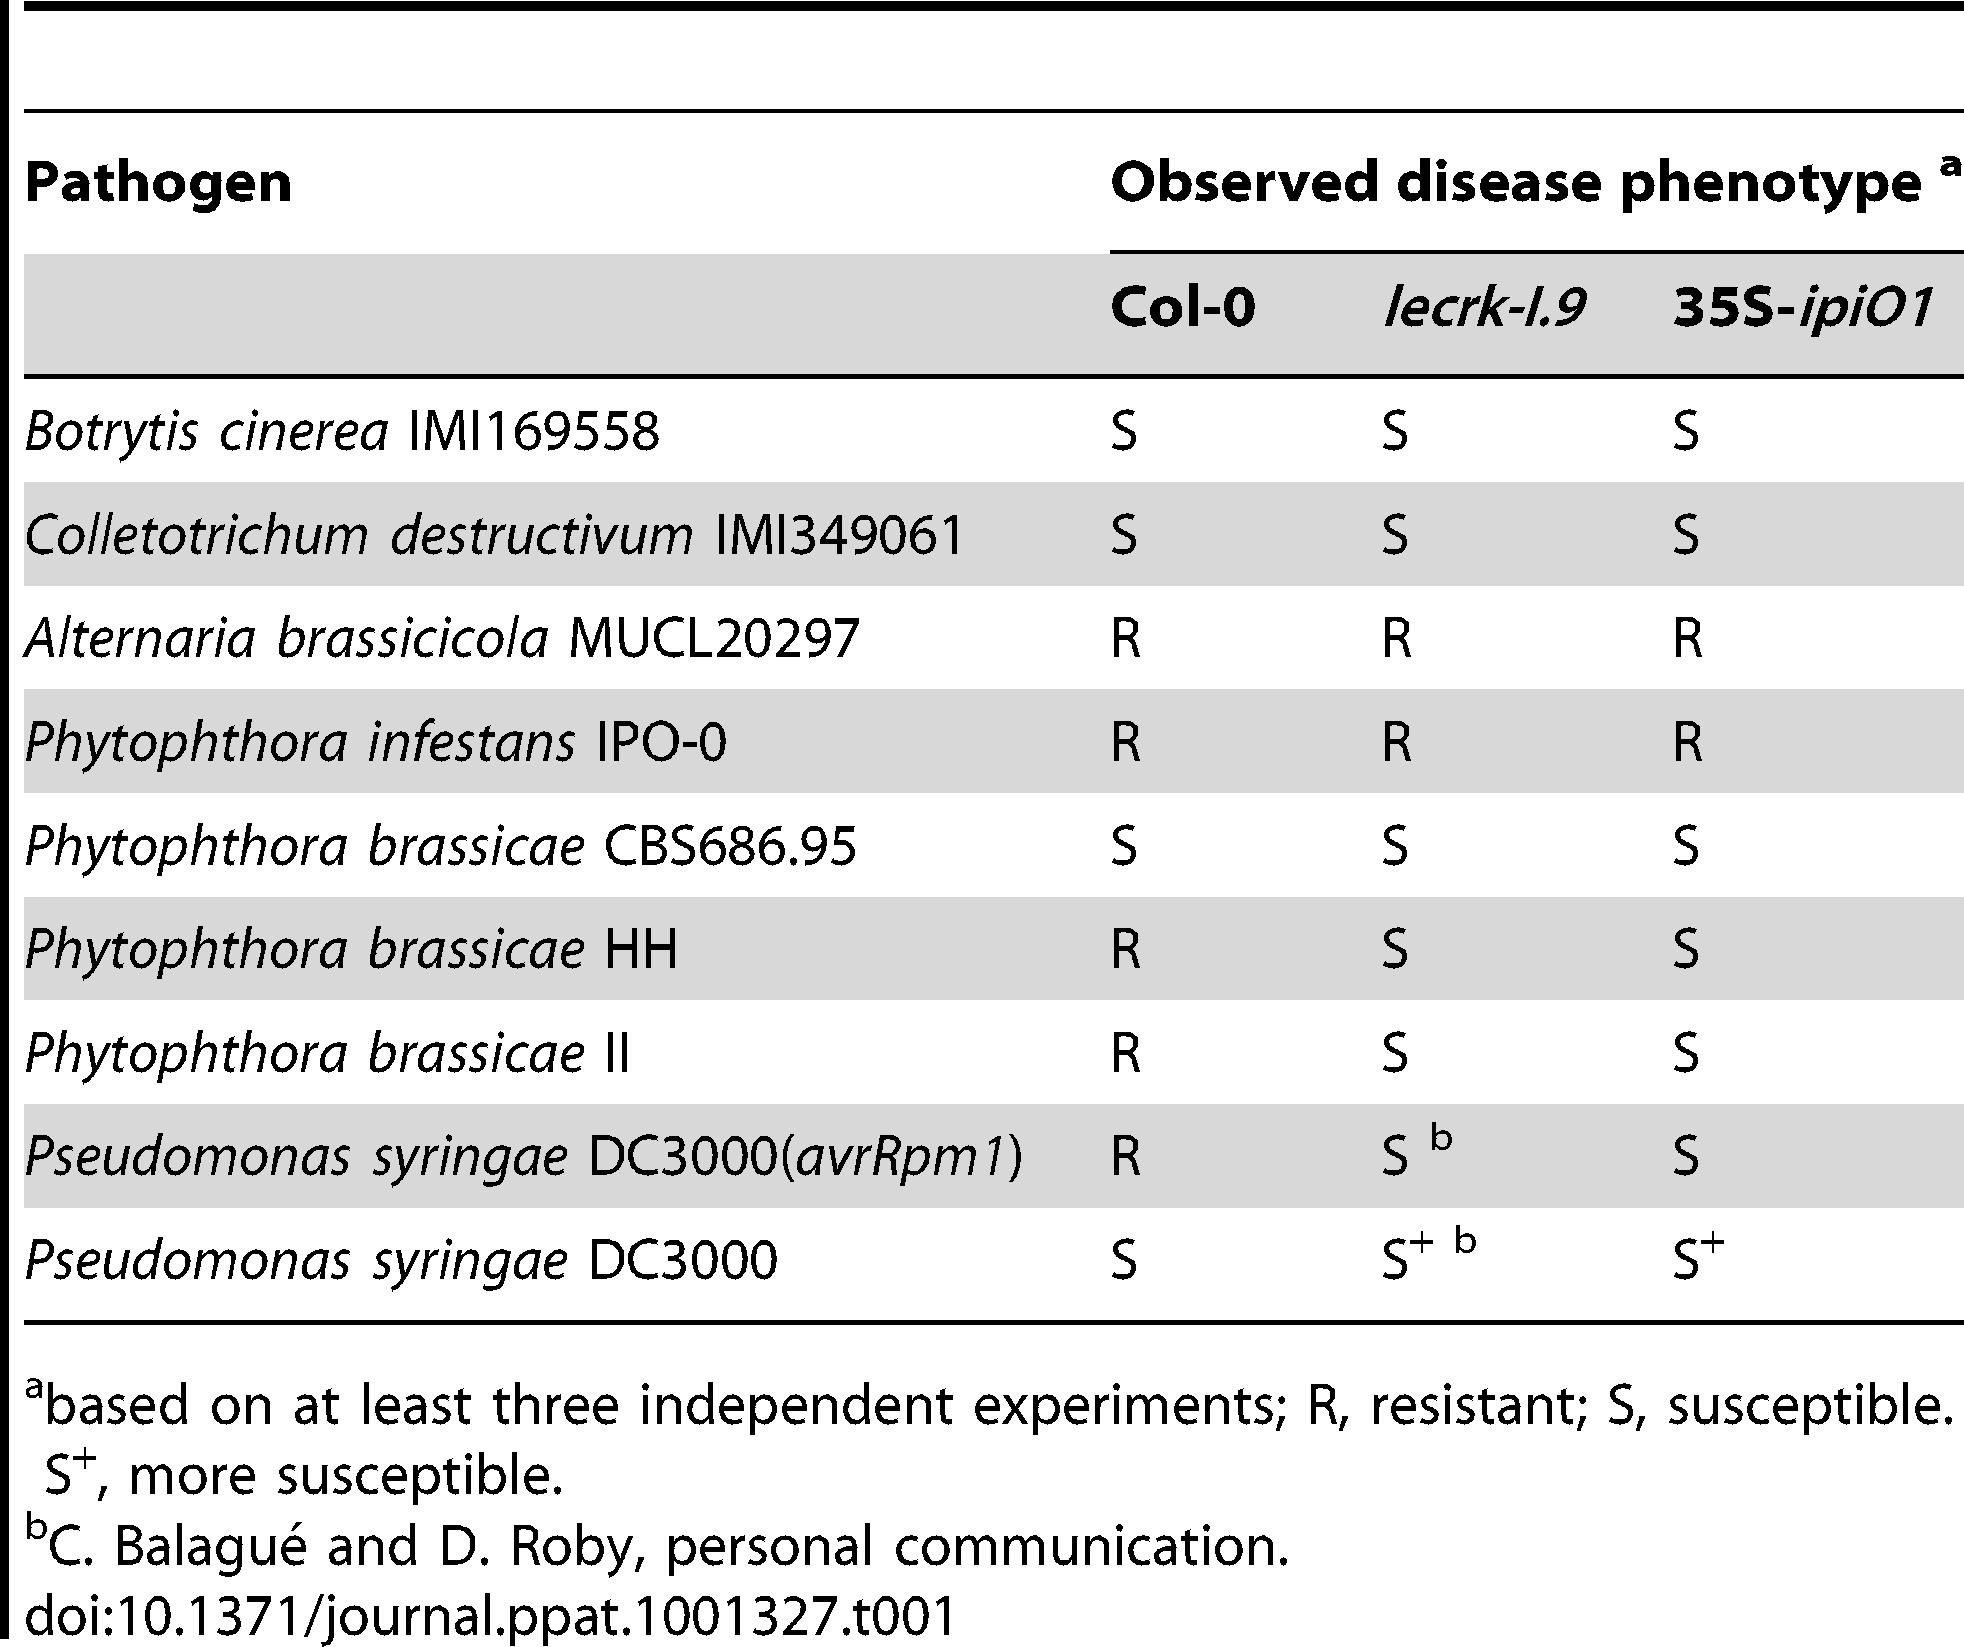 Gain of susceptibility to <i>Phytophthora brassicae</i> in Arabidopsis Col-0, <i>lecrk-I.9</i> and 35S-<i>ipiO1</i> lines.